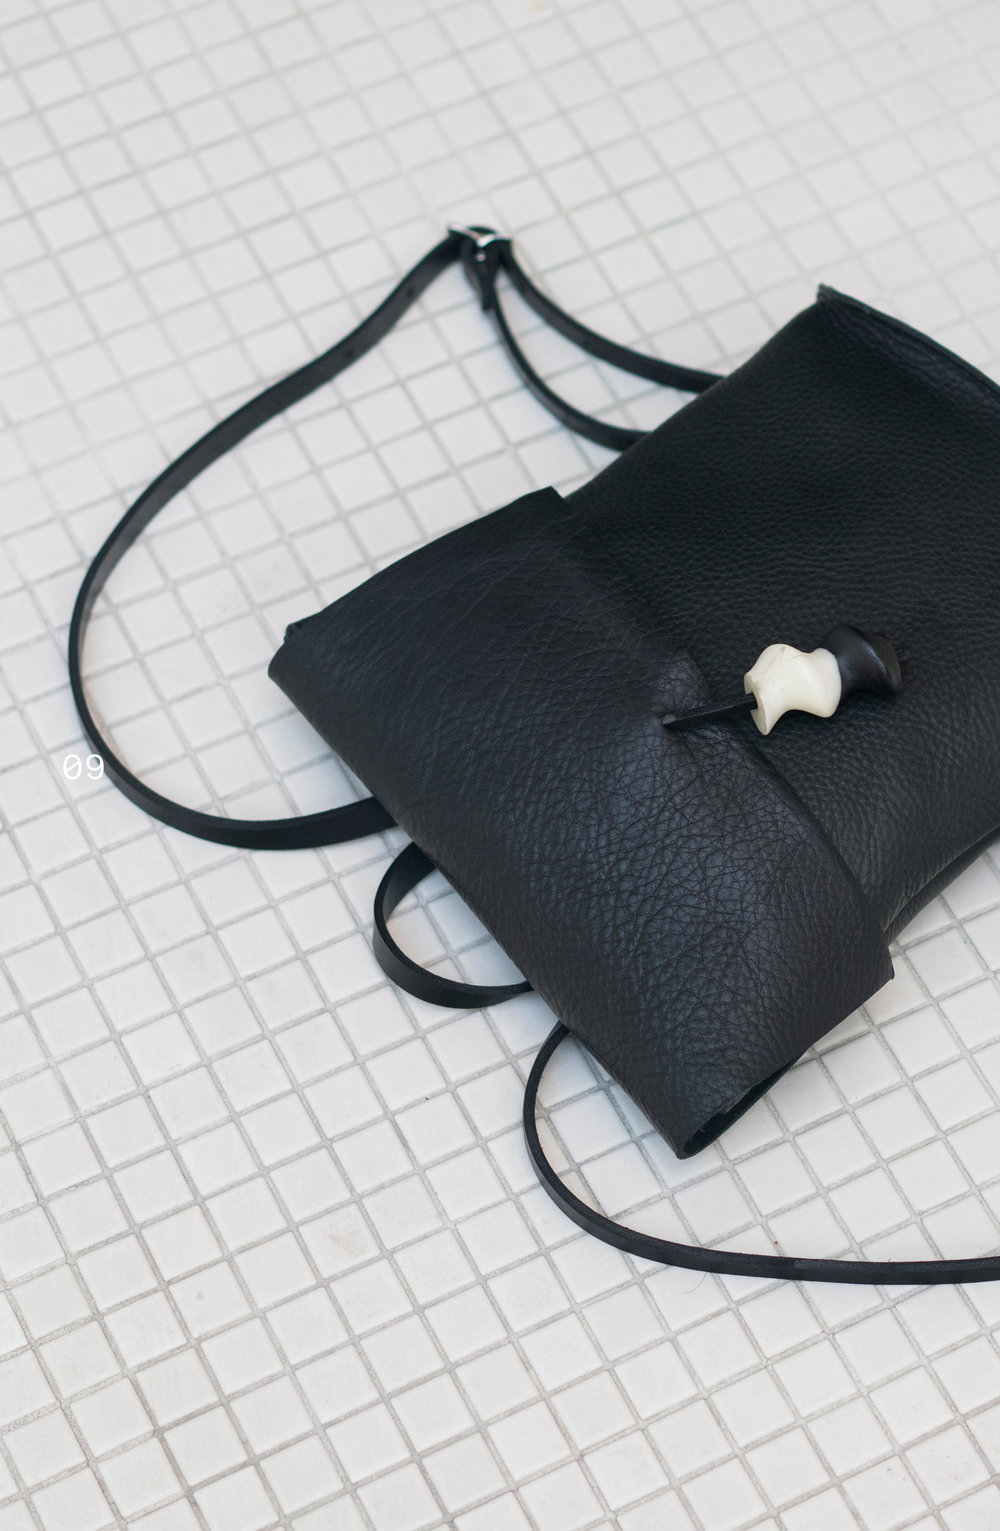 Sonya Lee - Harcourt bag 02/10